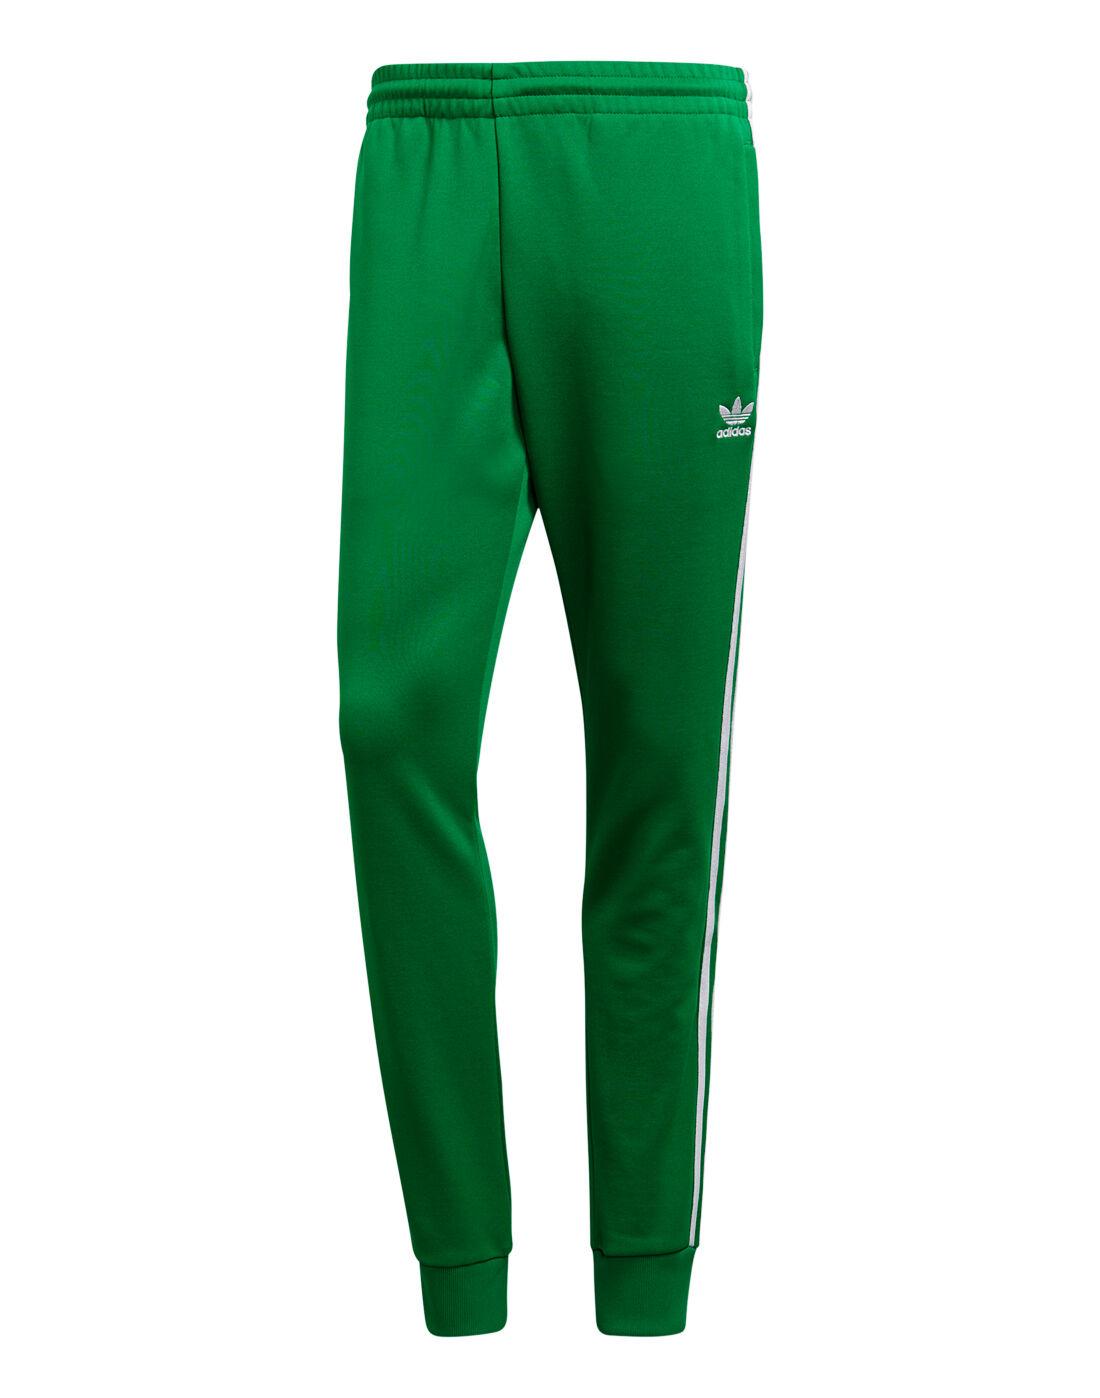 Men's Green adidas Originals Superstar